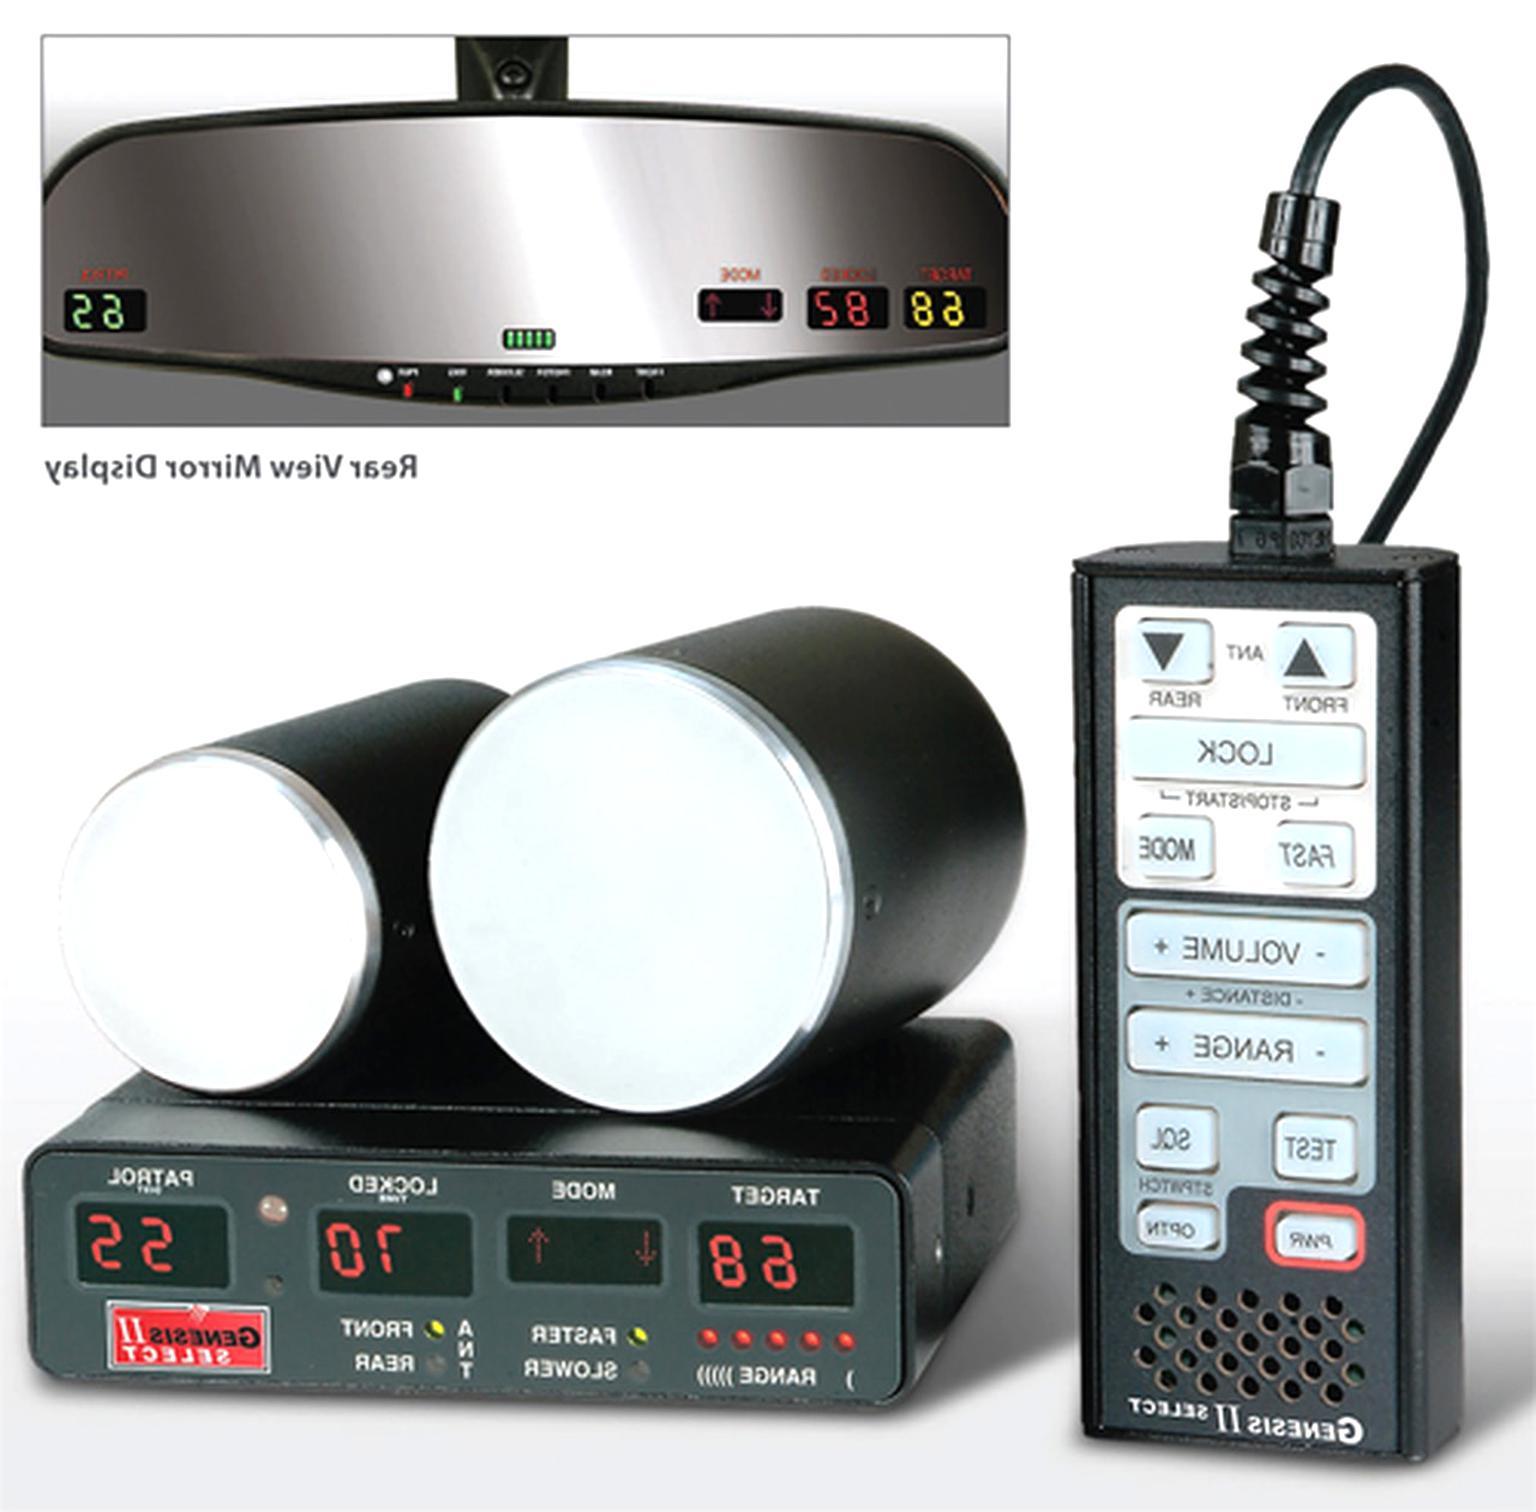 Genesis Police Radar For Sale